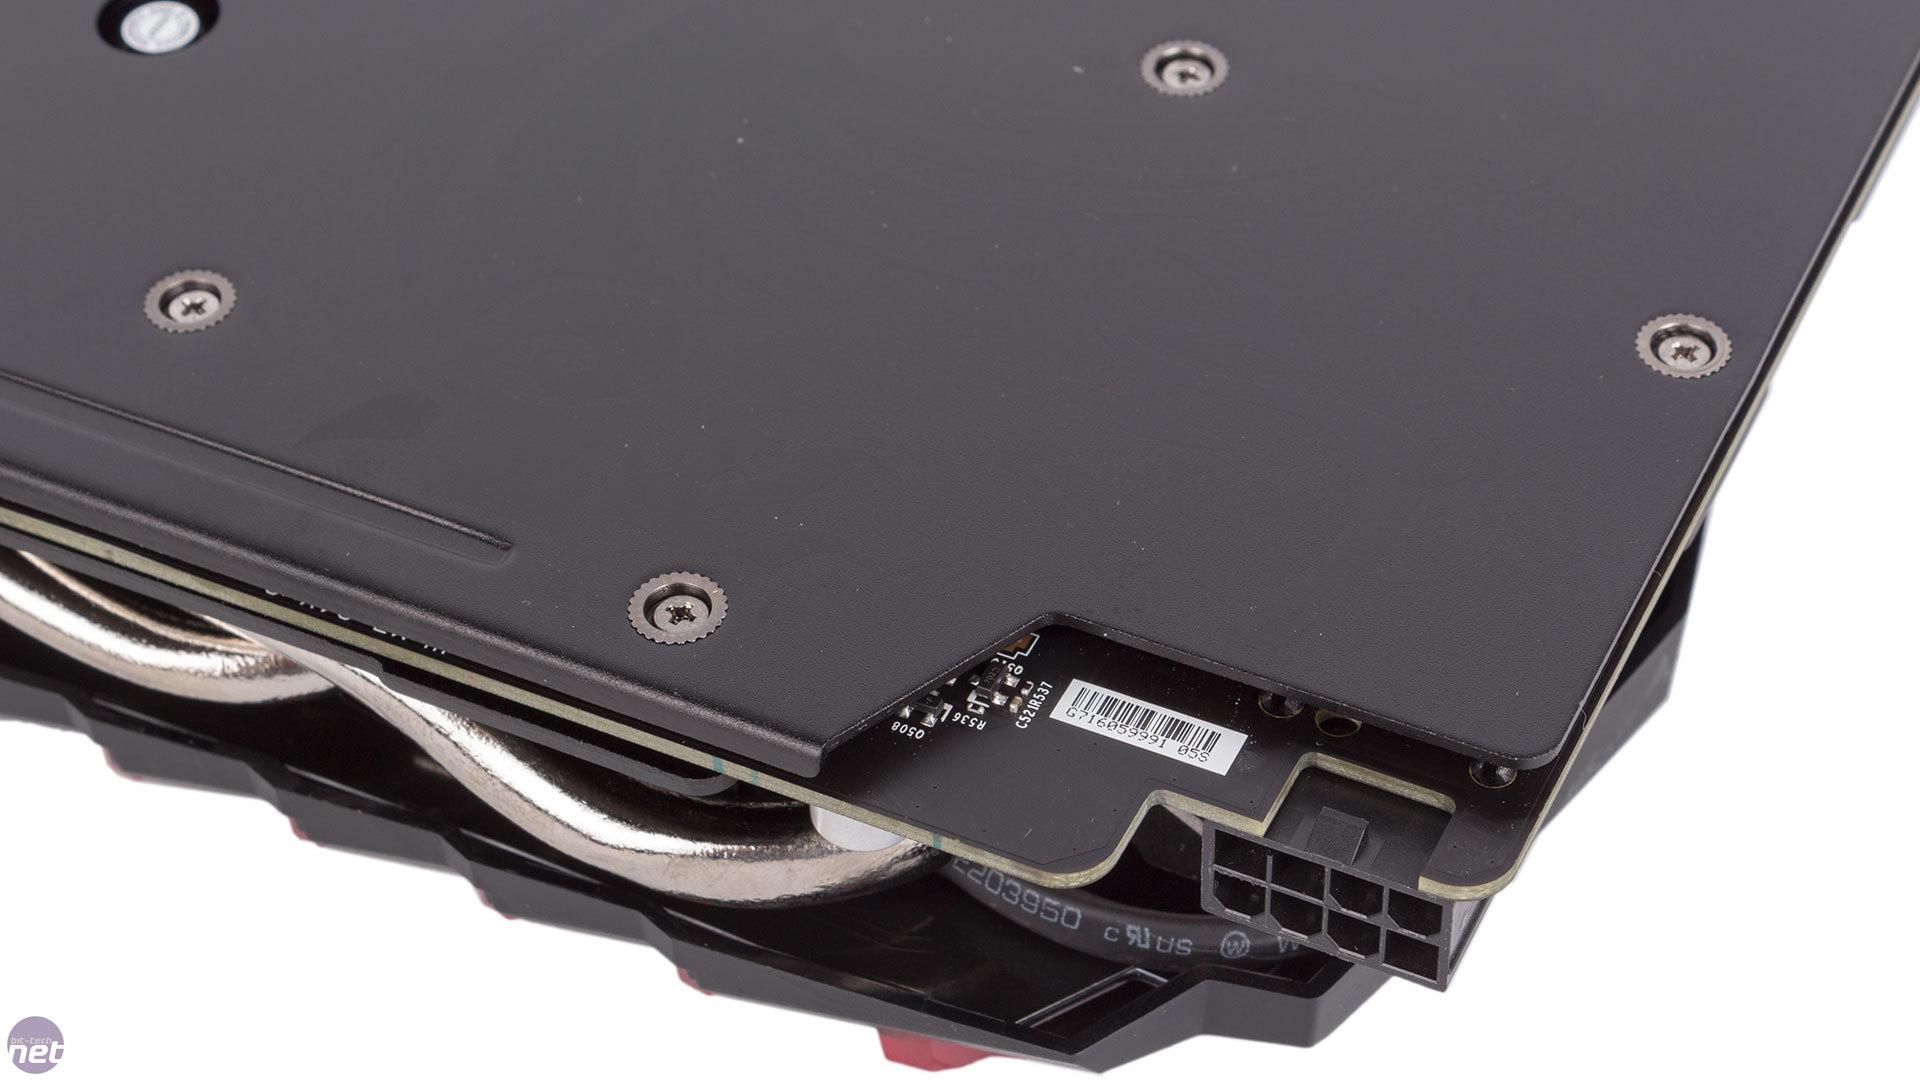 MSI GeForce GTX 1060 Gaming X 6G Review | bit-tech net